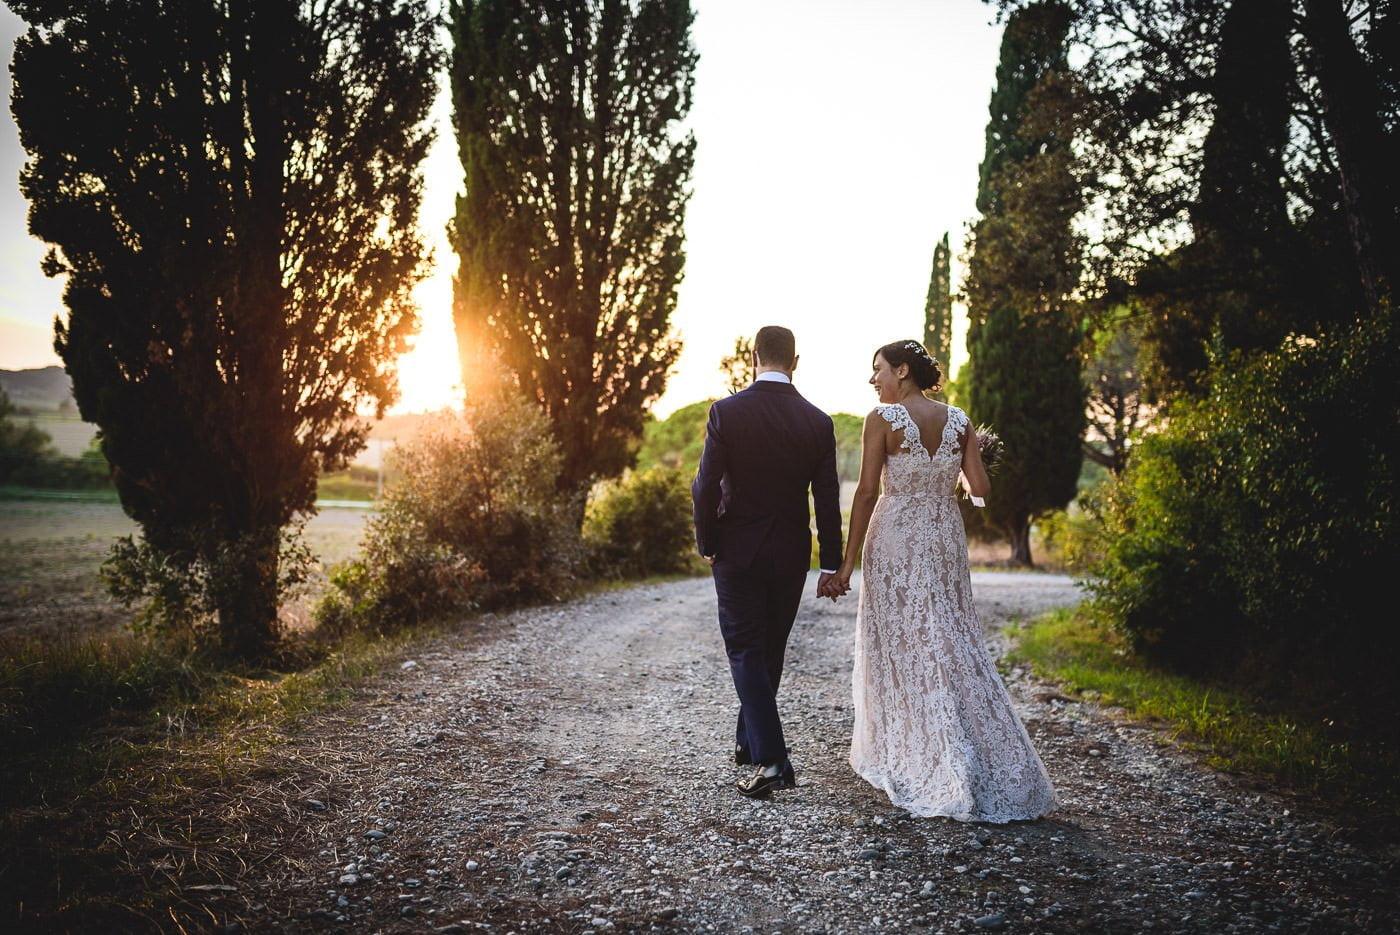 Matrimonio Giulia & Federico 09_15 – Alessio Nobili Photographer-44